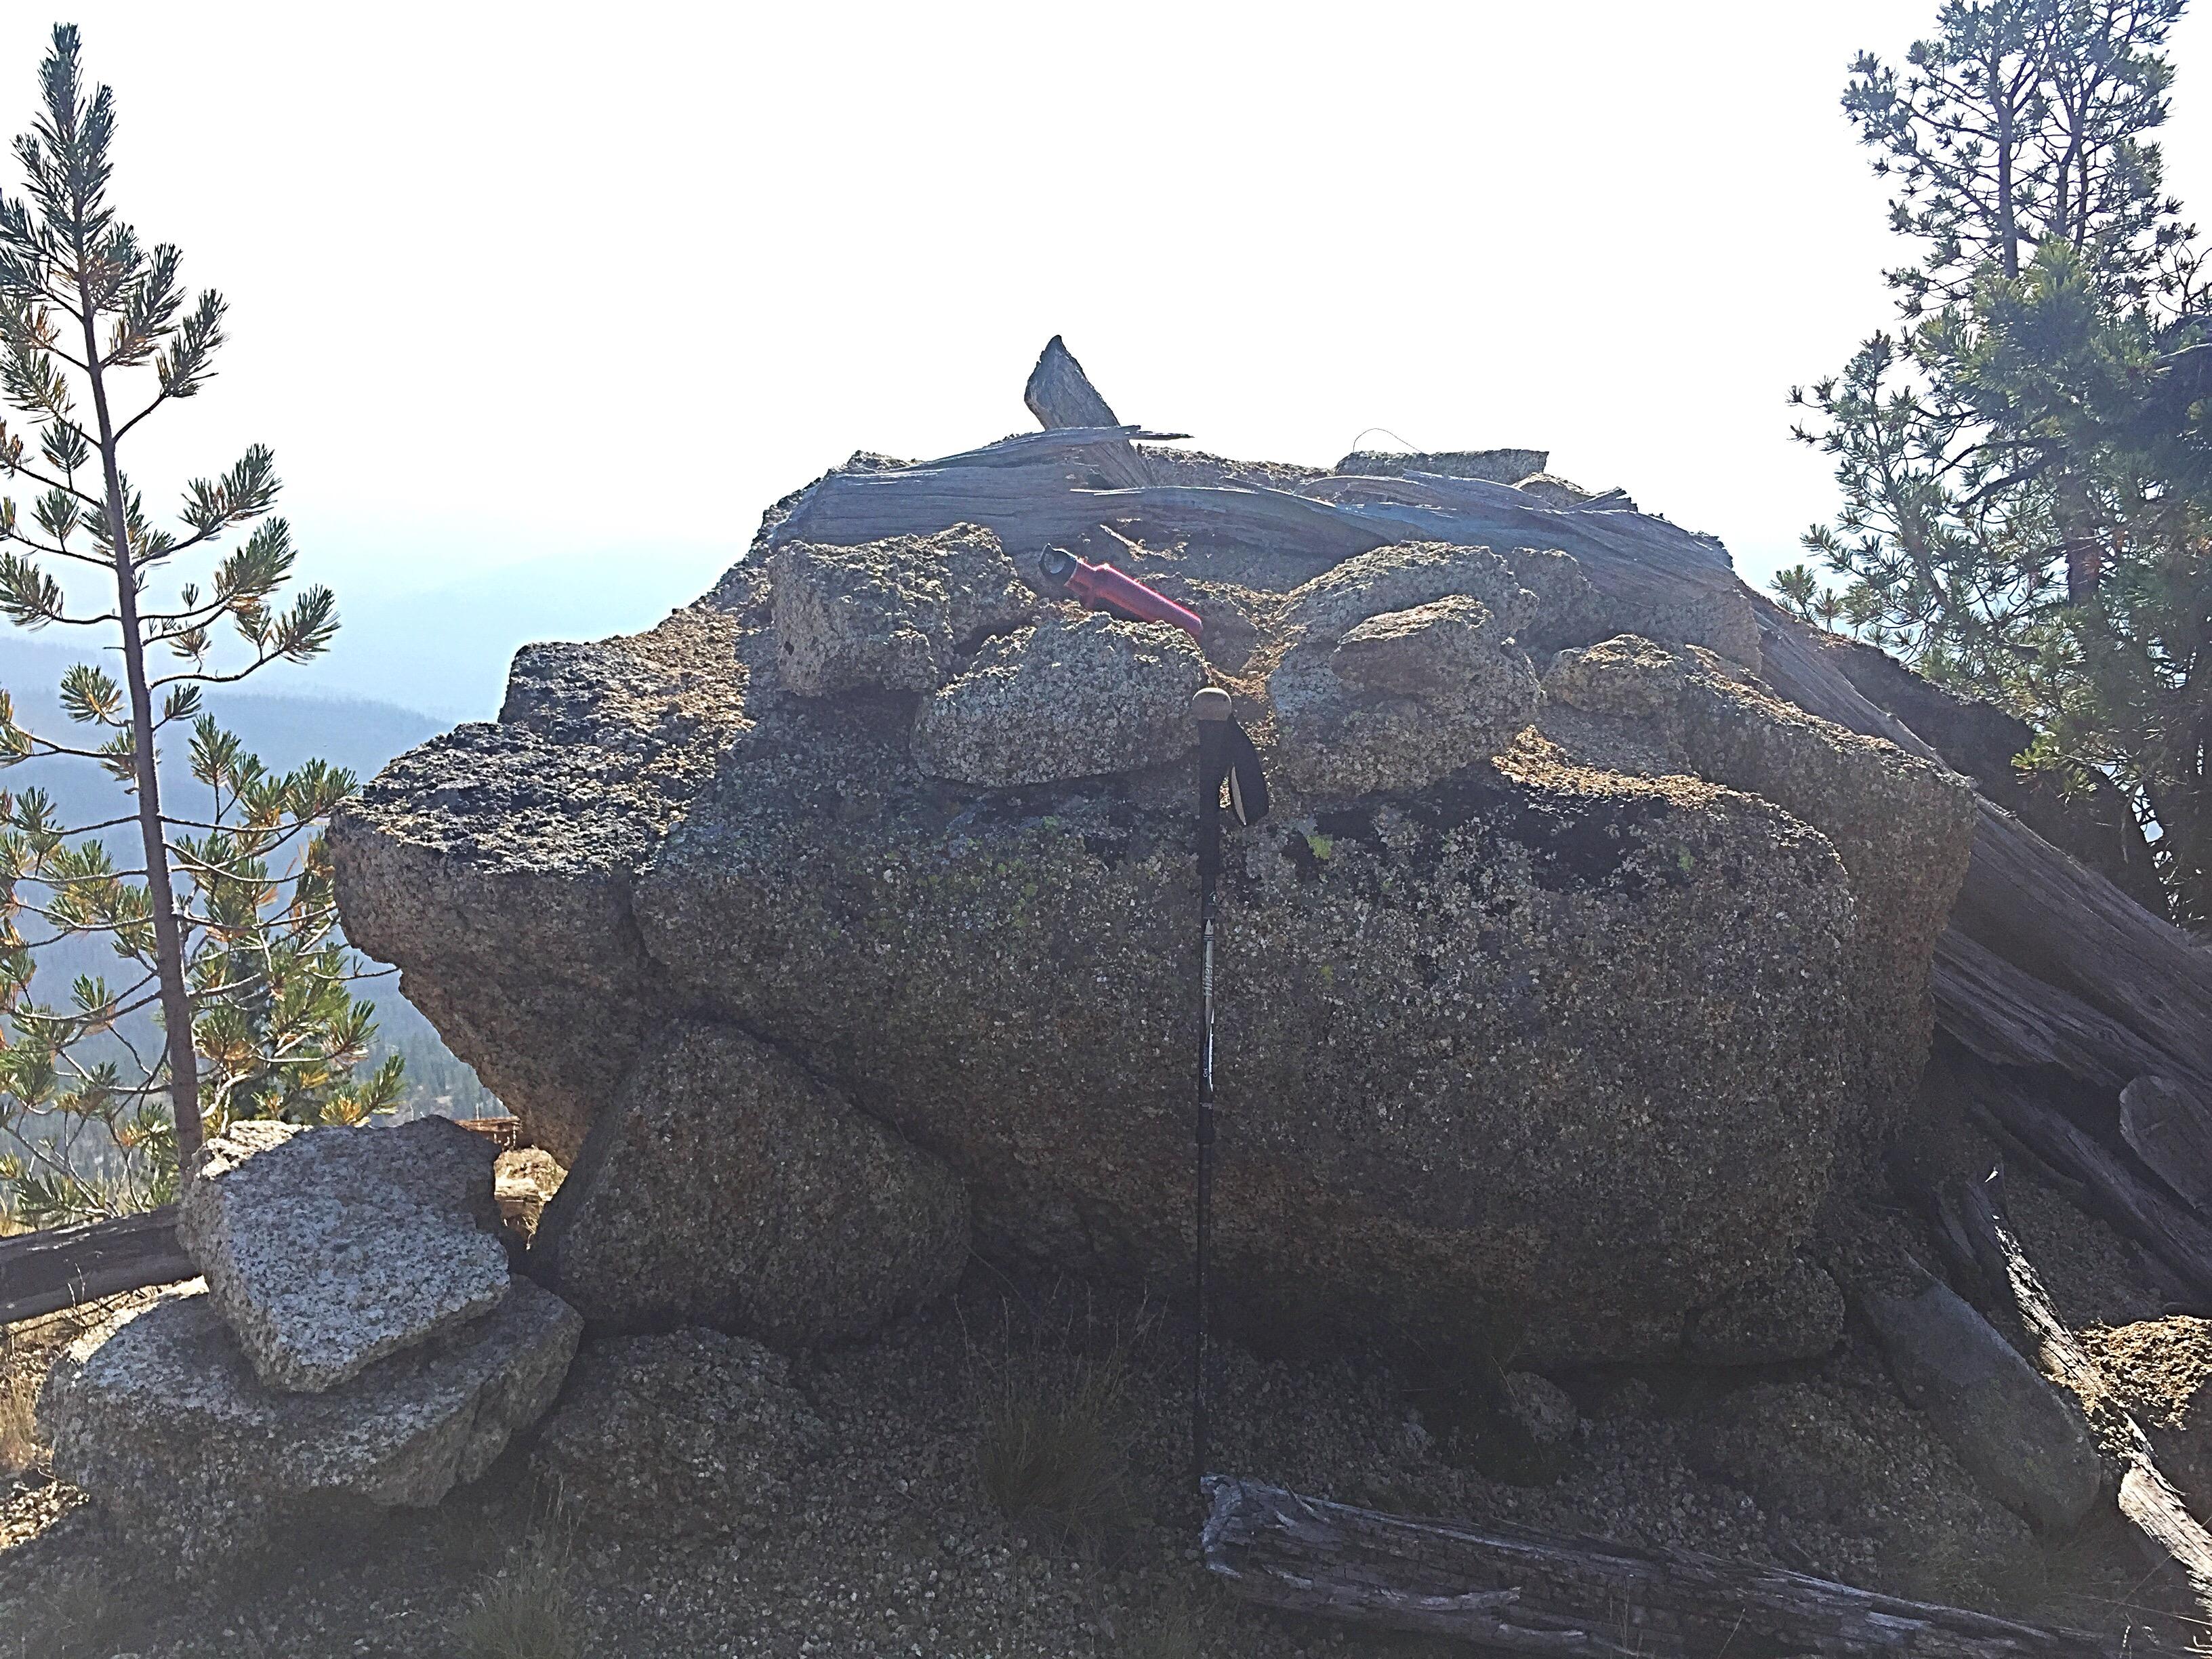 The summit rock.